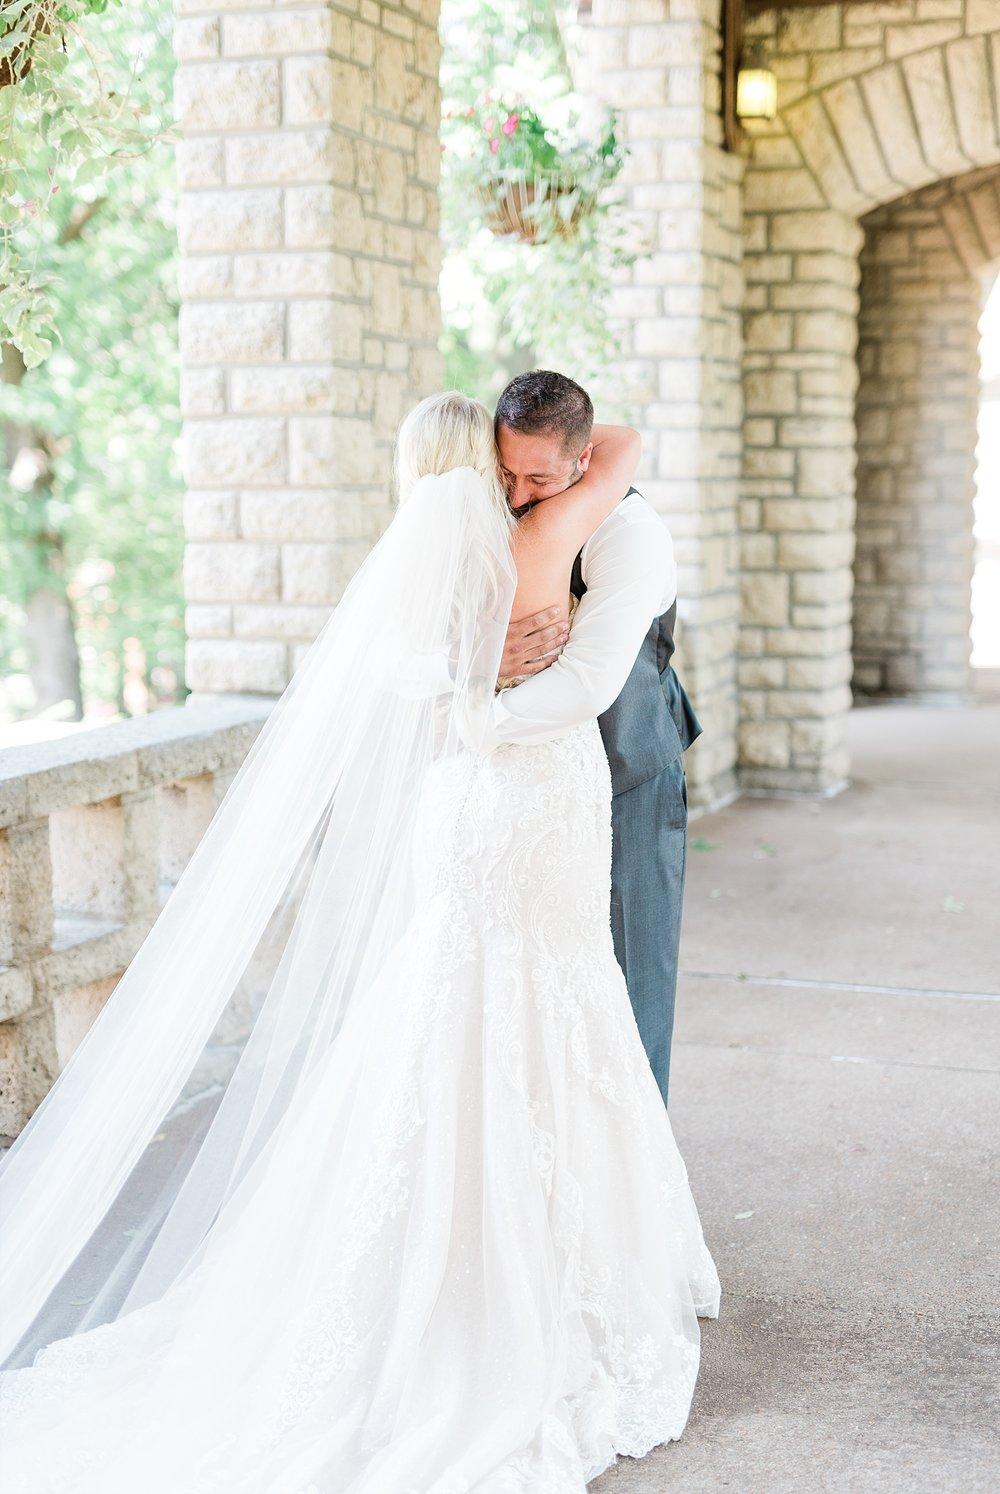 Alan and Heather Horn Wedding by Kelsi Kliethermes Photography Associate - Rachel_0038.jpg